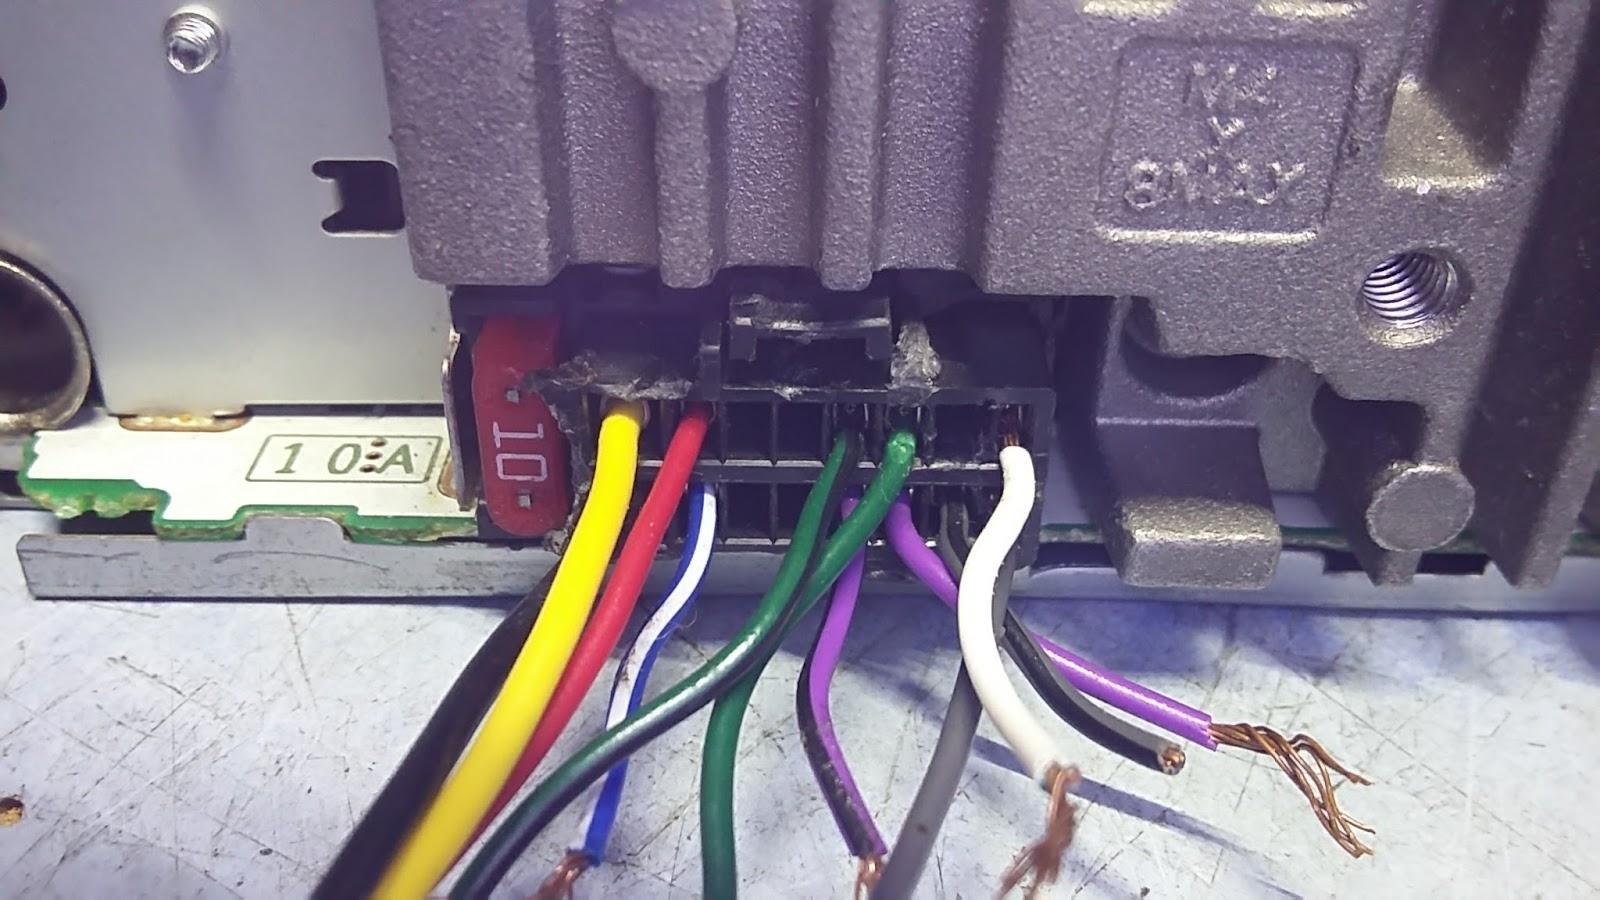 20161003_183332_LLS ivega eletr�nica novembro 2016 pioneer deh x1710ub wiring diagram at crackthecode.co